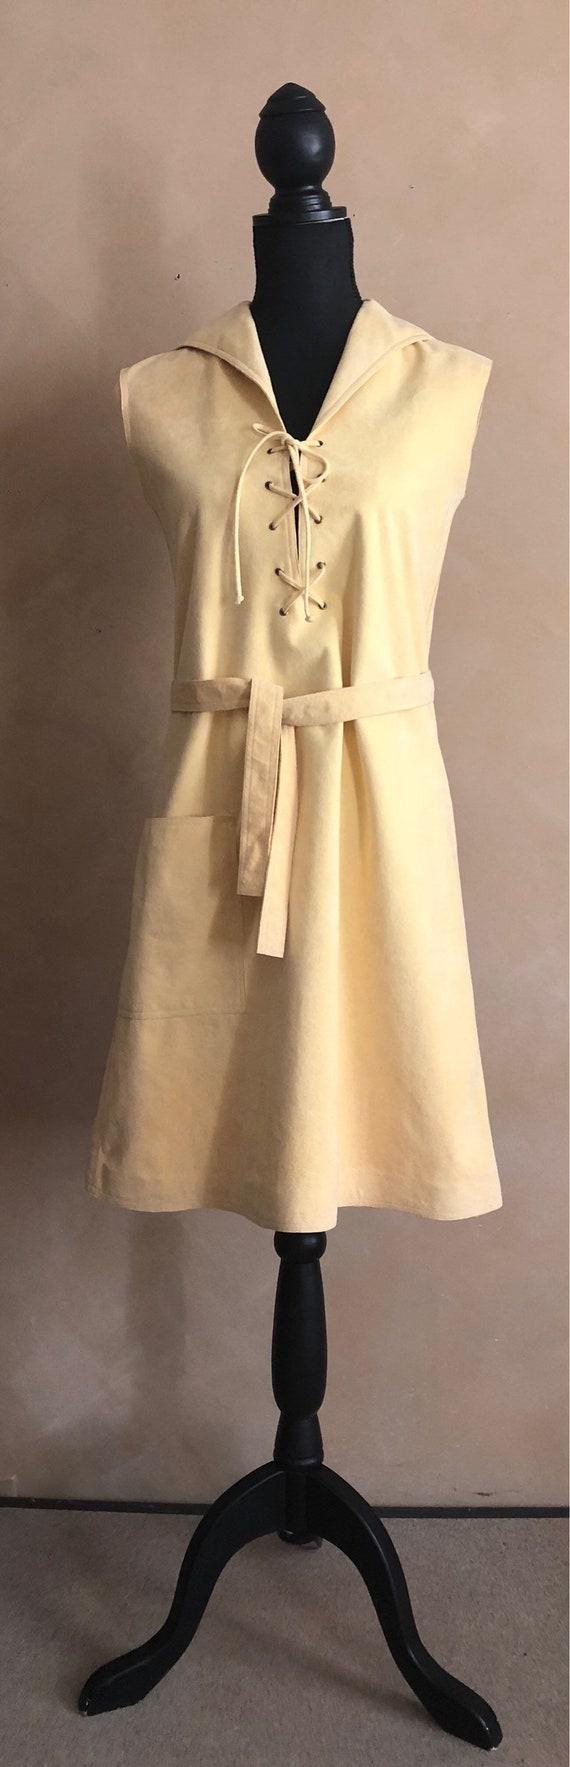 Halston Vintage 70's Dress -  Ultra Seude Yellow Dress